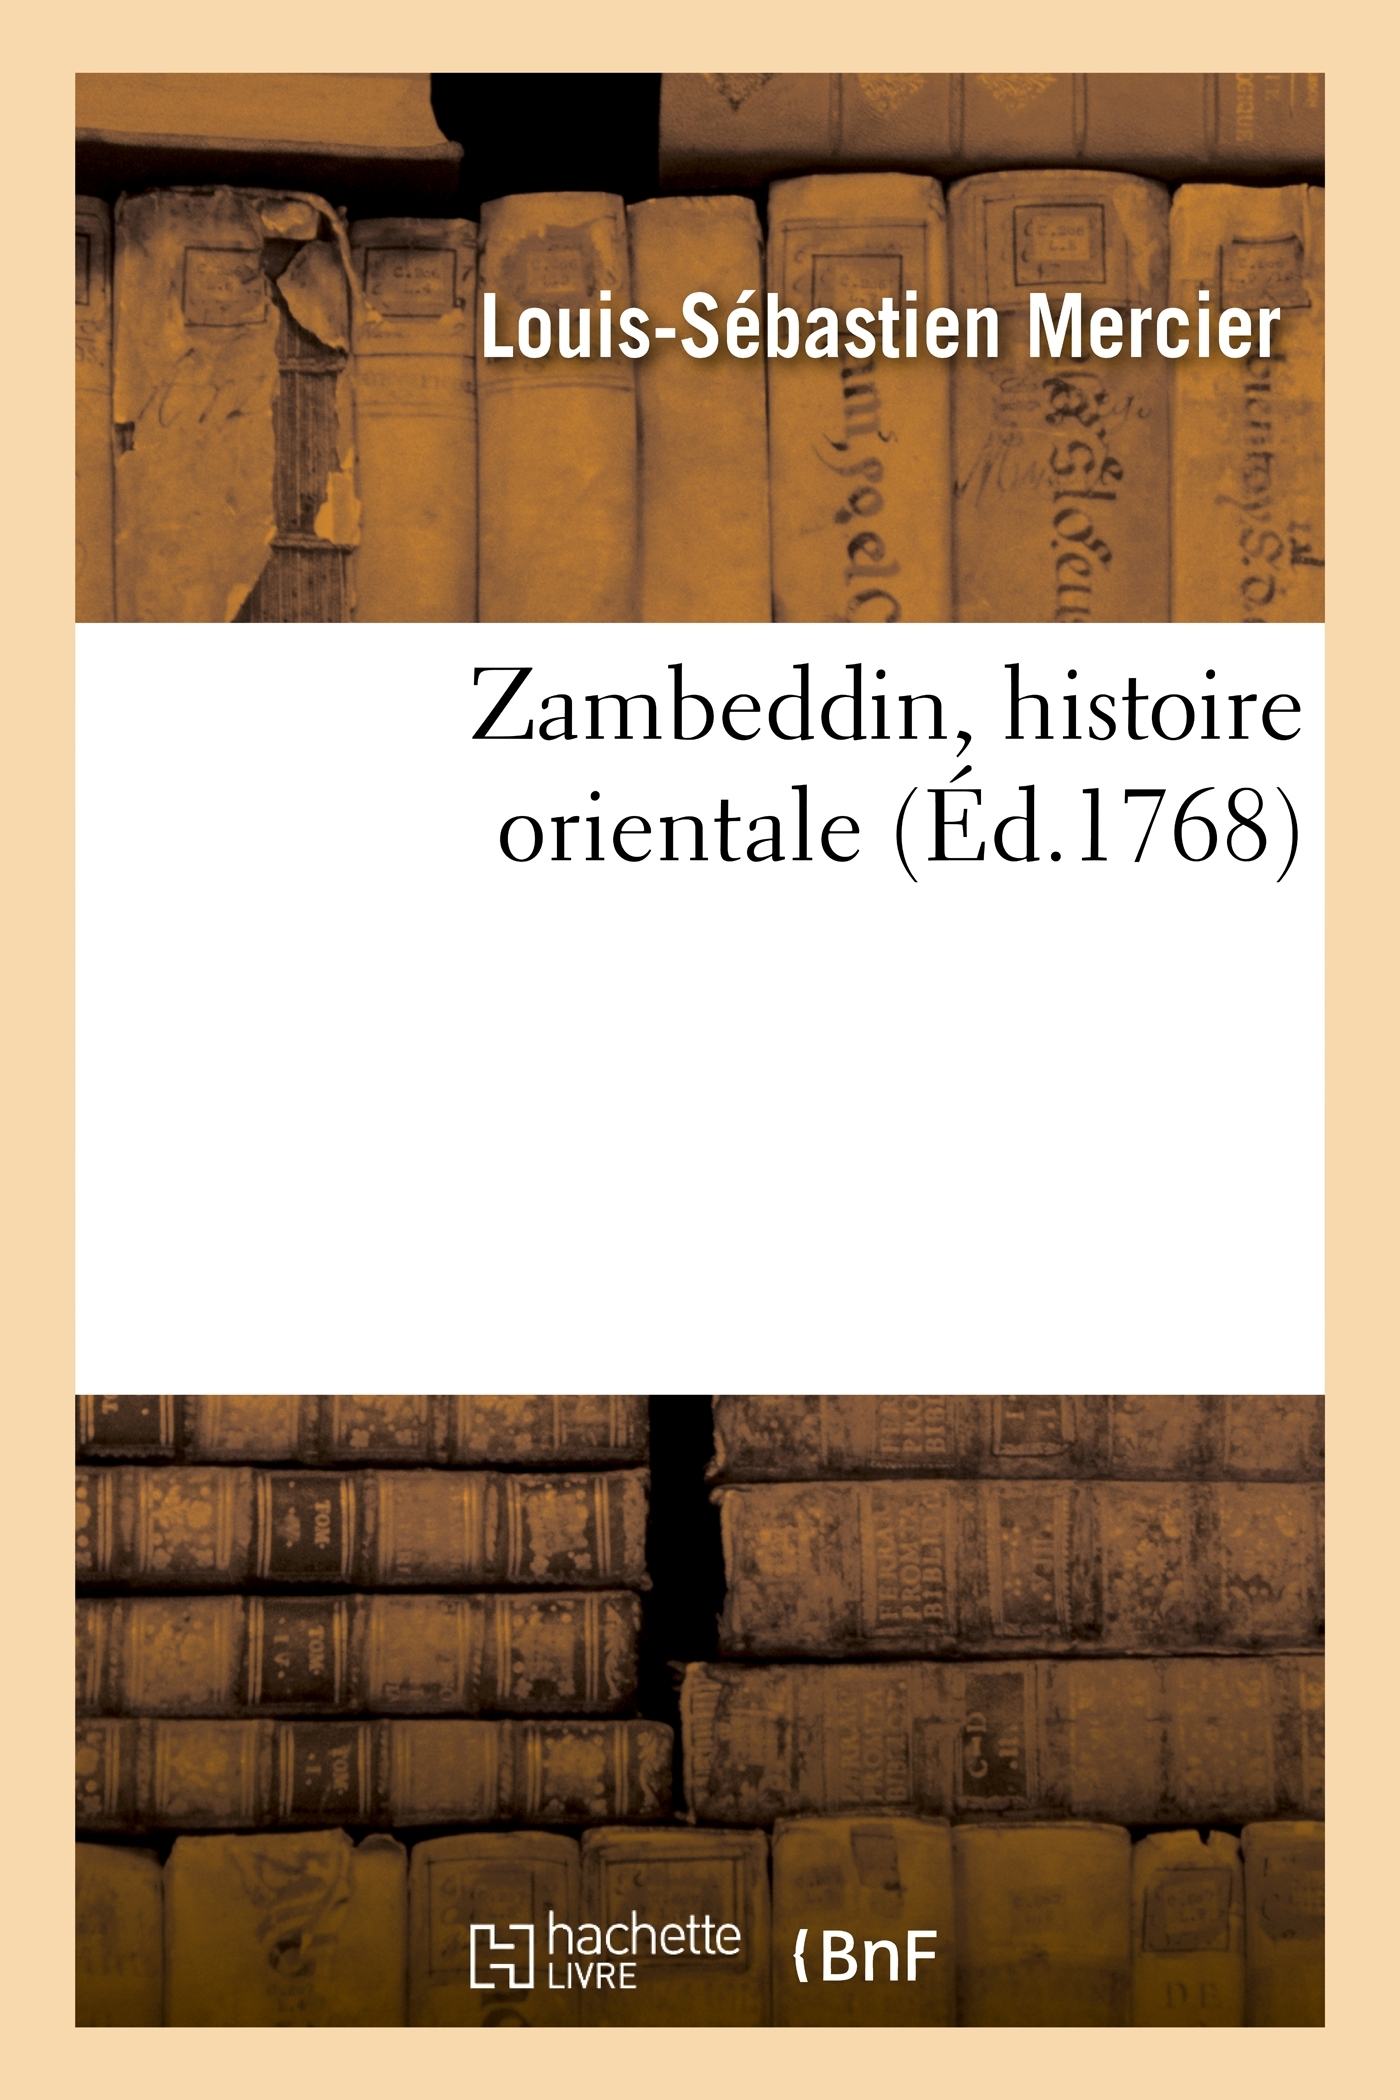 ZAMBEDDIN, HISTOIRE ORIENTALE